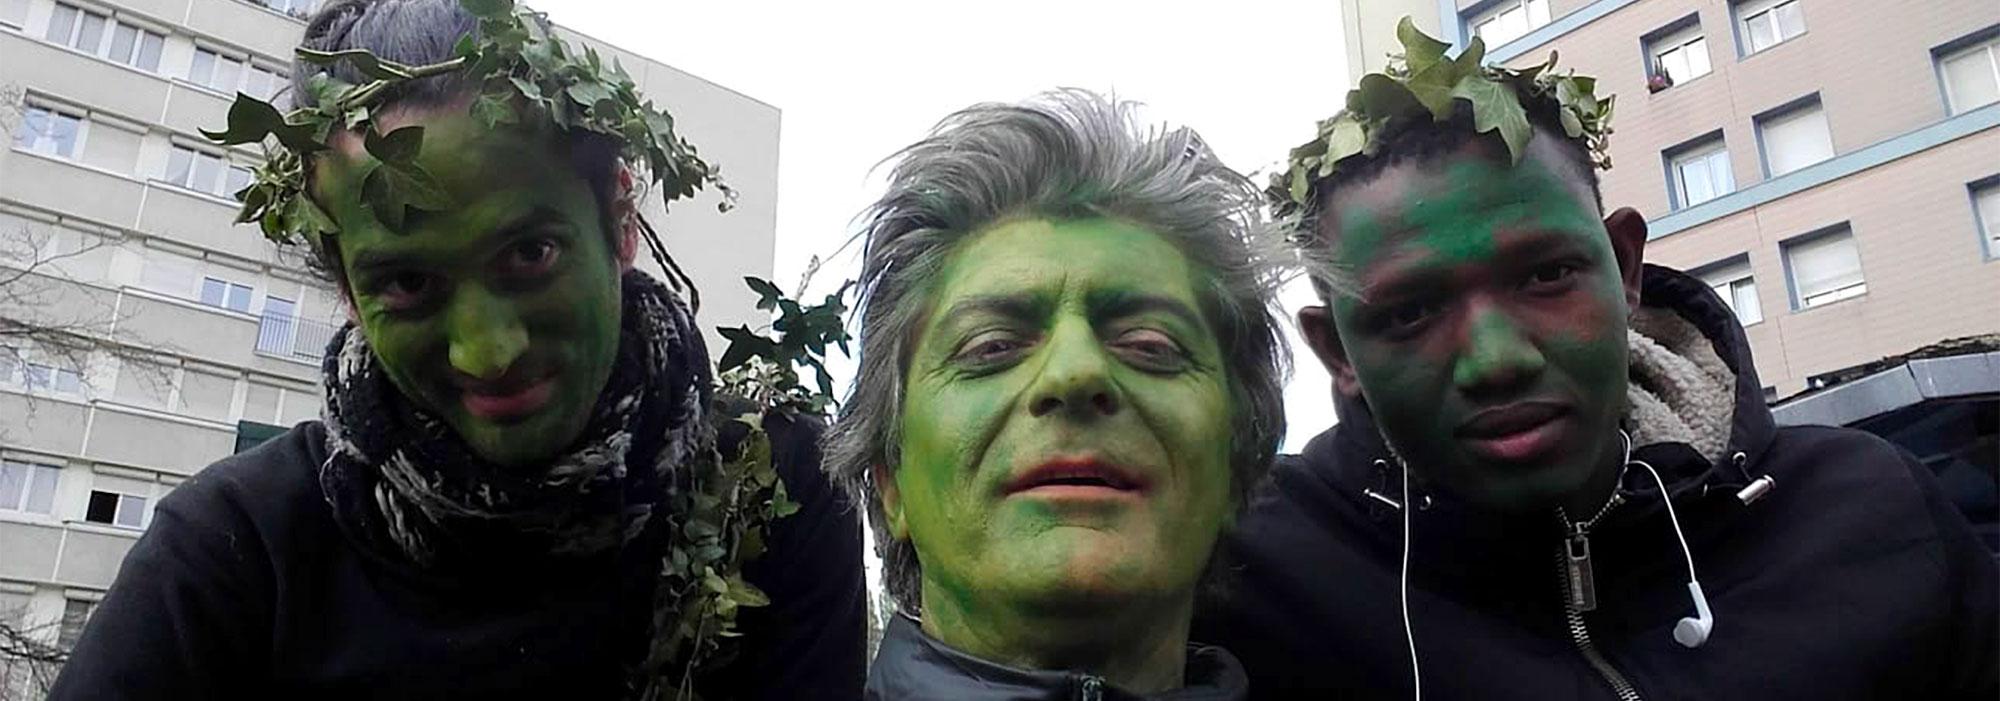 Trois hommes habillés en vert et en feuilles